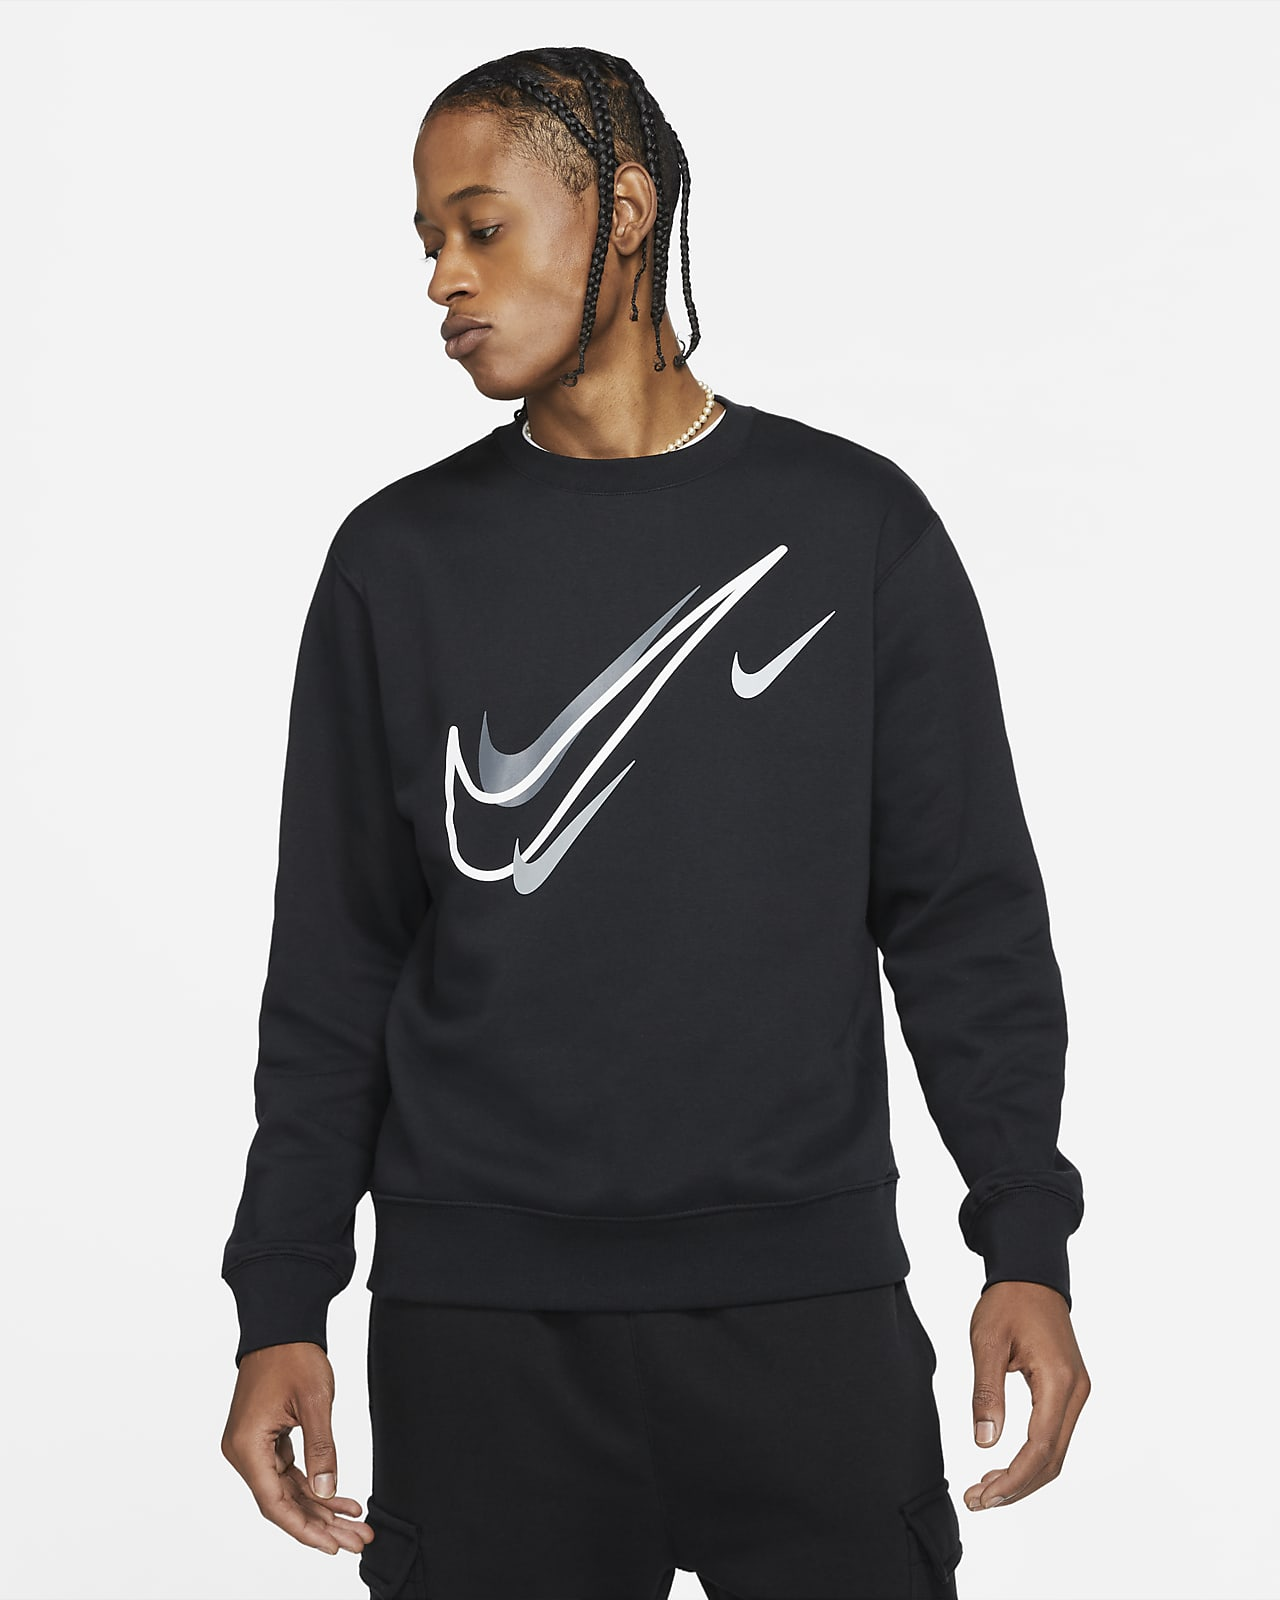 Fleecetröja Nike Sportswear för män